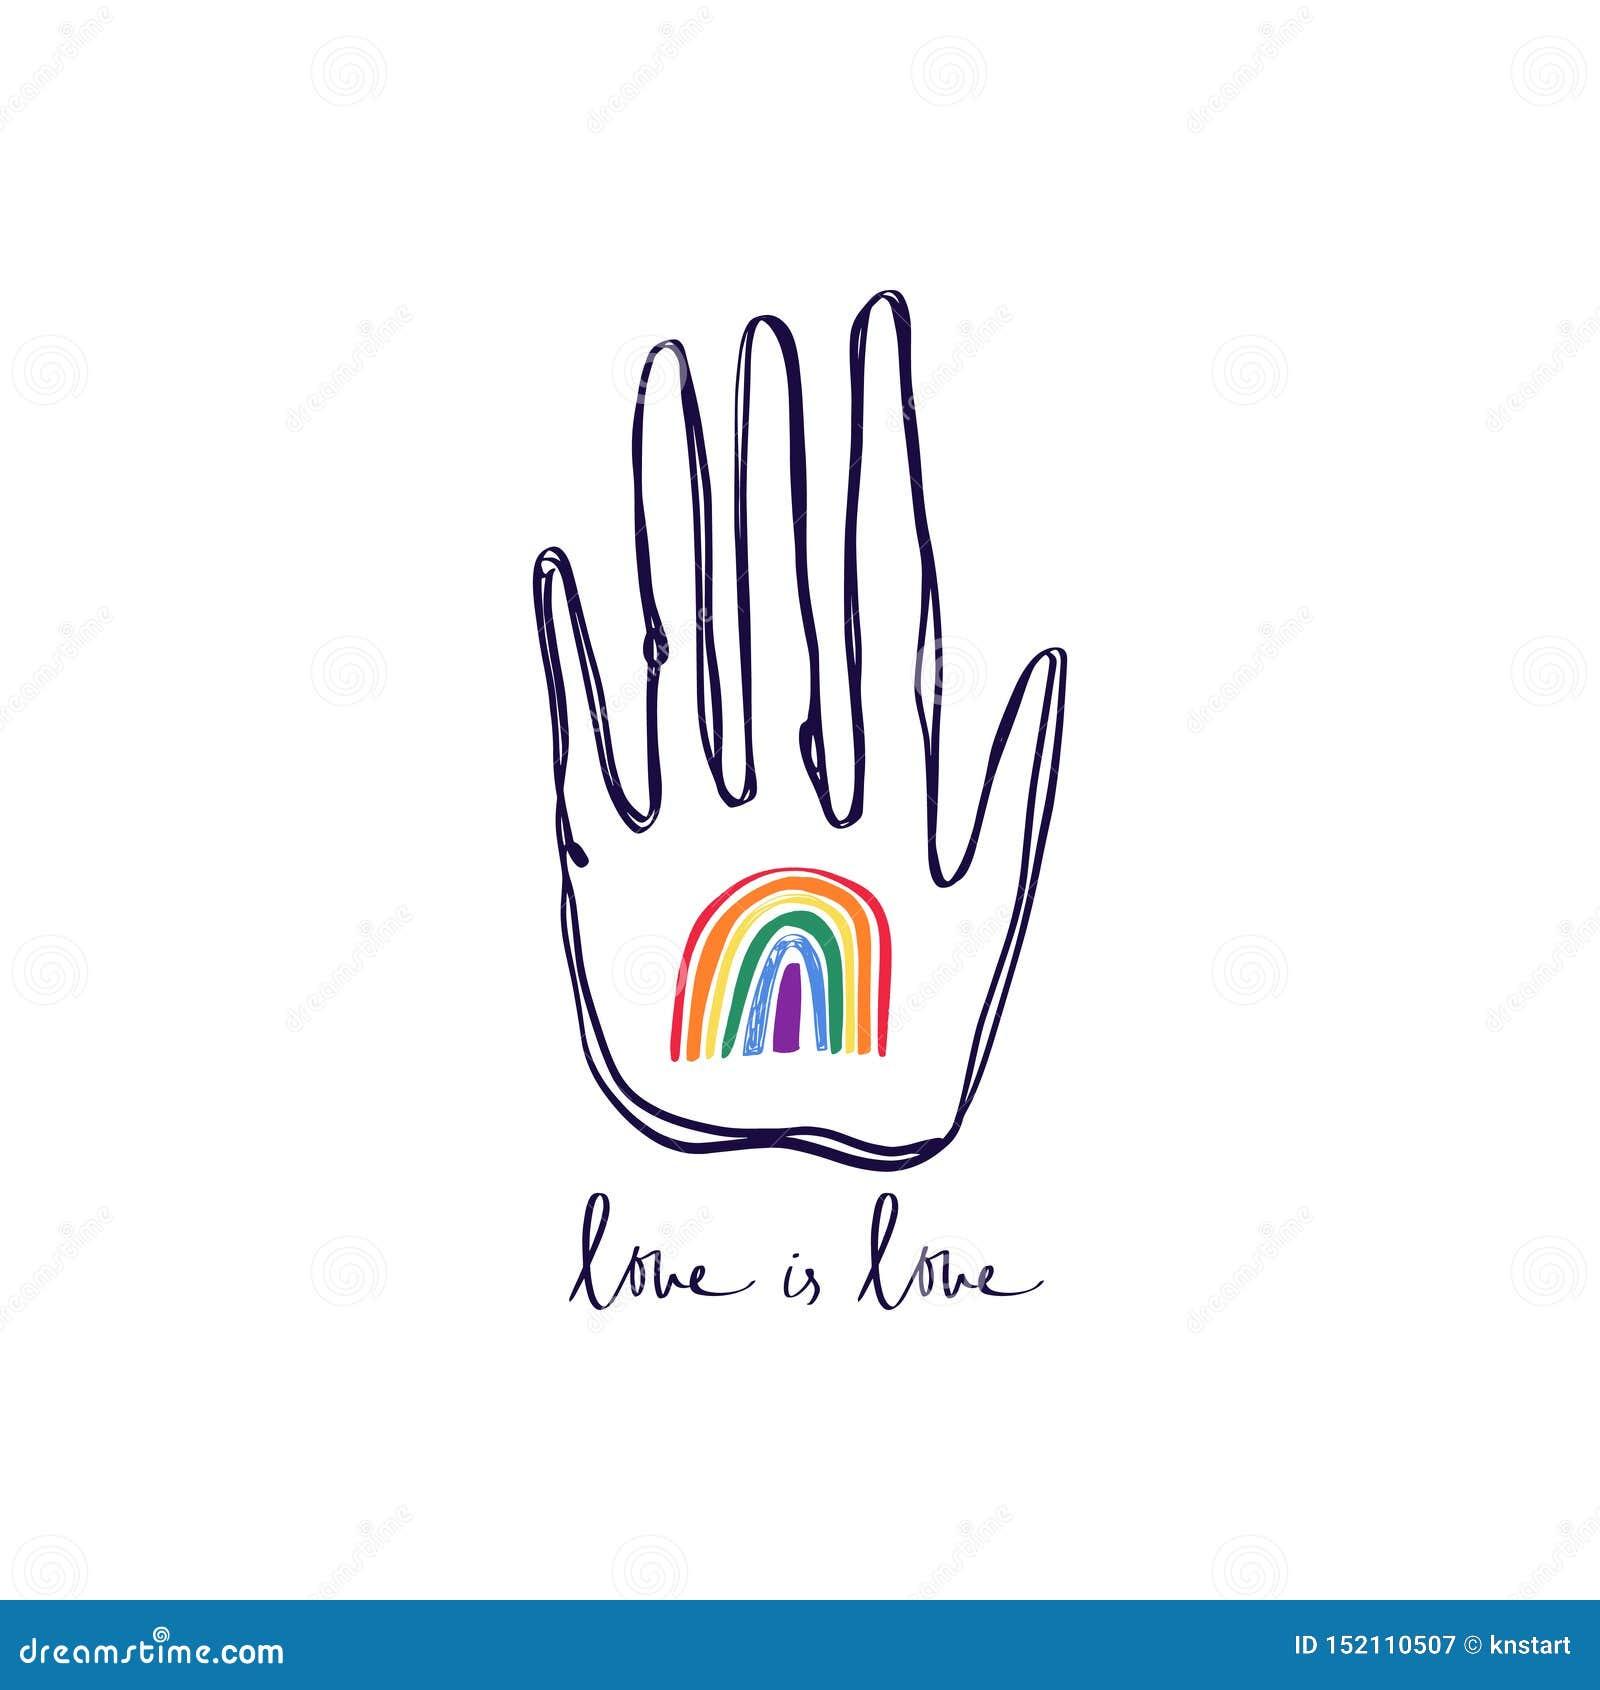 LGBT手,停止同性恋恐惧症,与手拉的彩虹,人权遵守的手印刷品 女同性恋,快乐,两性,trans和